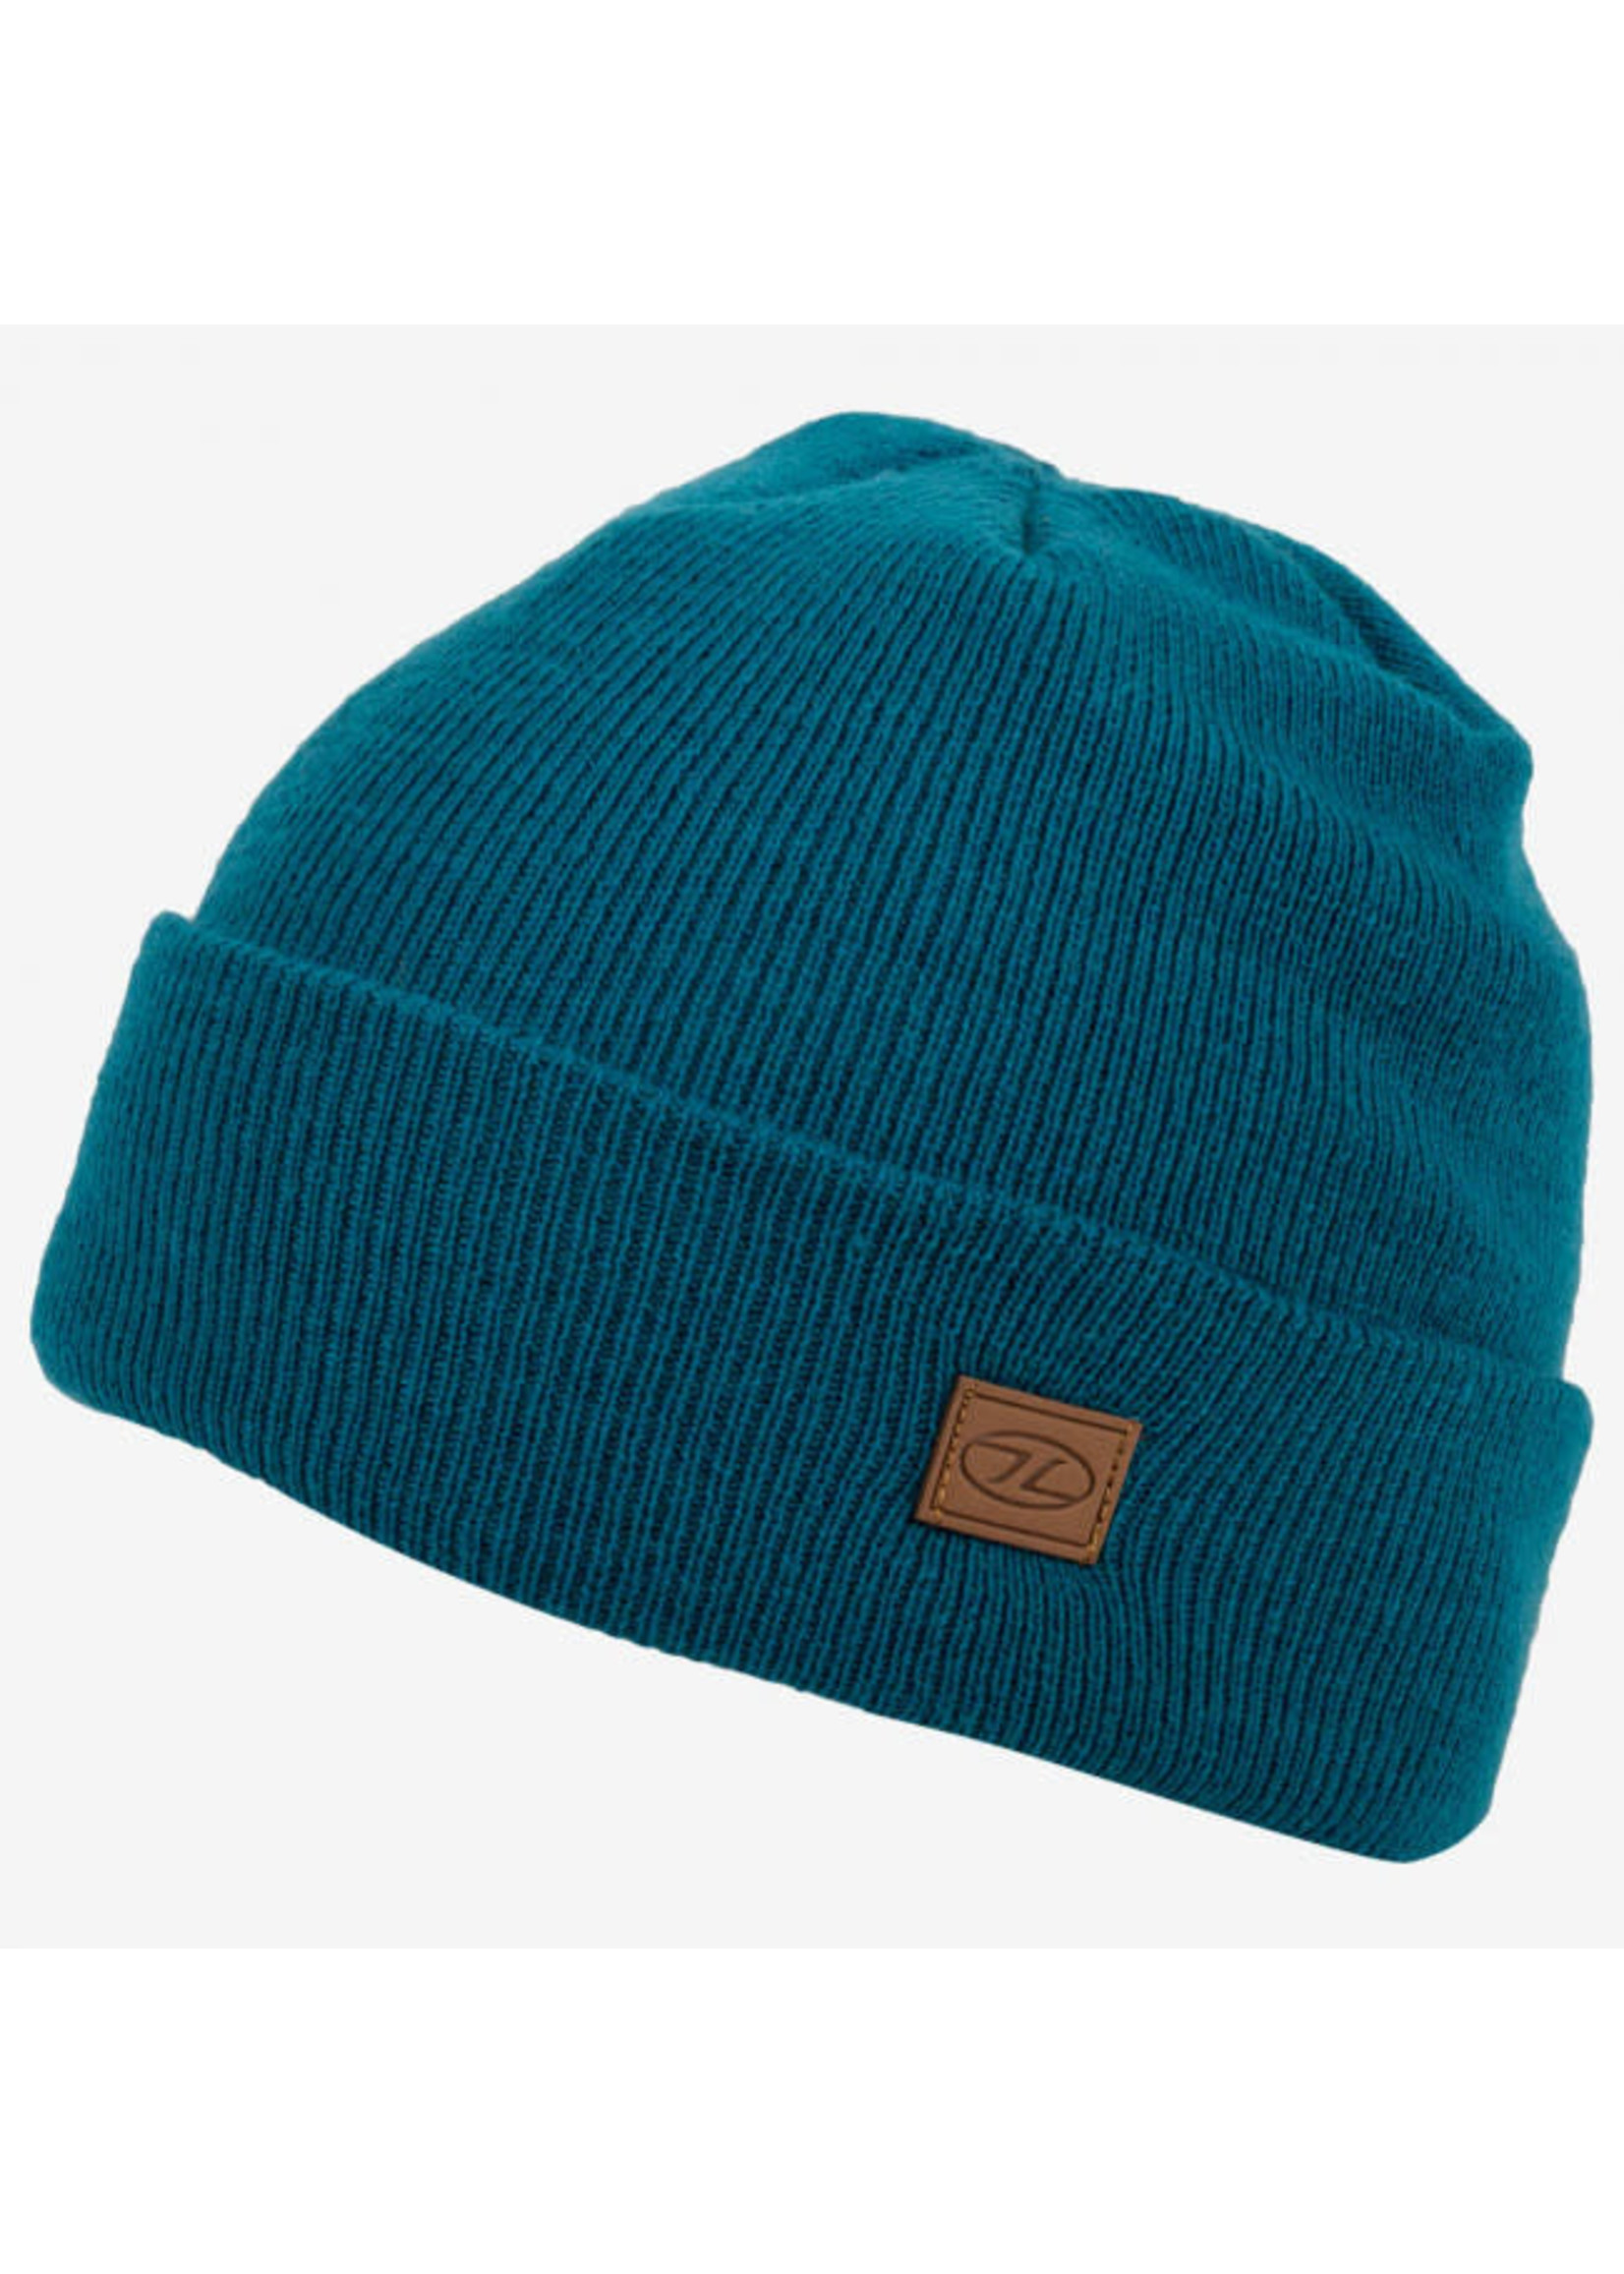 Highlander Highlander Thinsulate Ski Hat/Beanie Badge